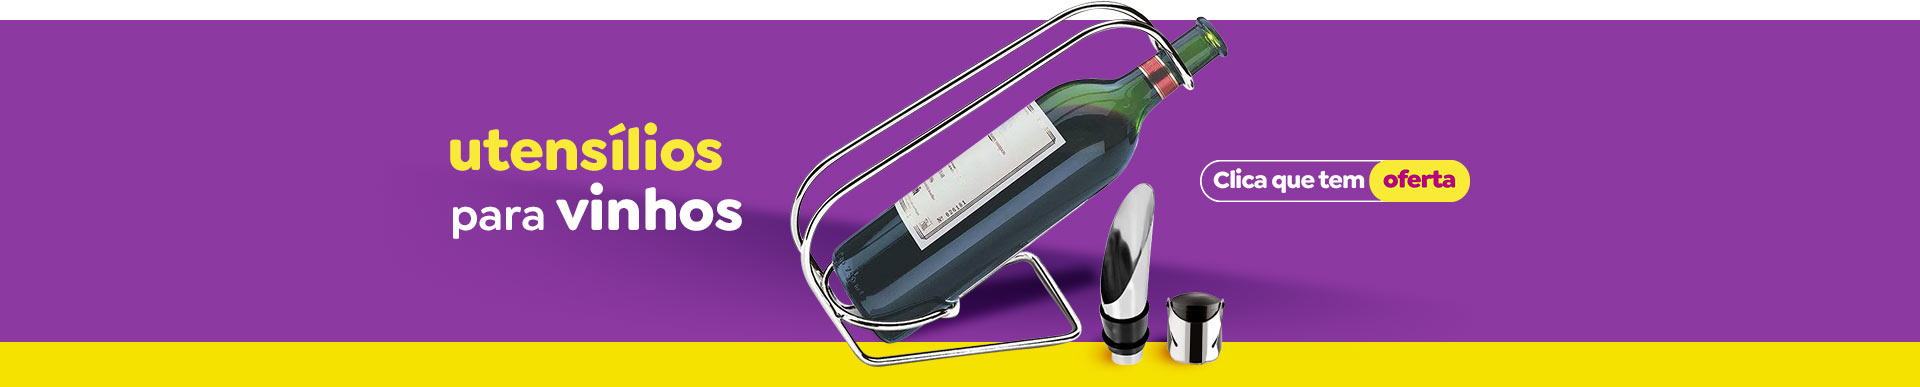 trade_2021-07-21_perene_bazar_utensilios-vinhos